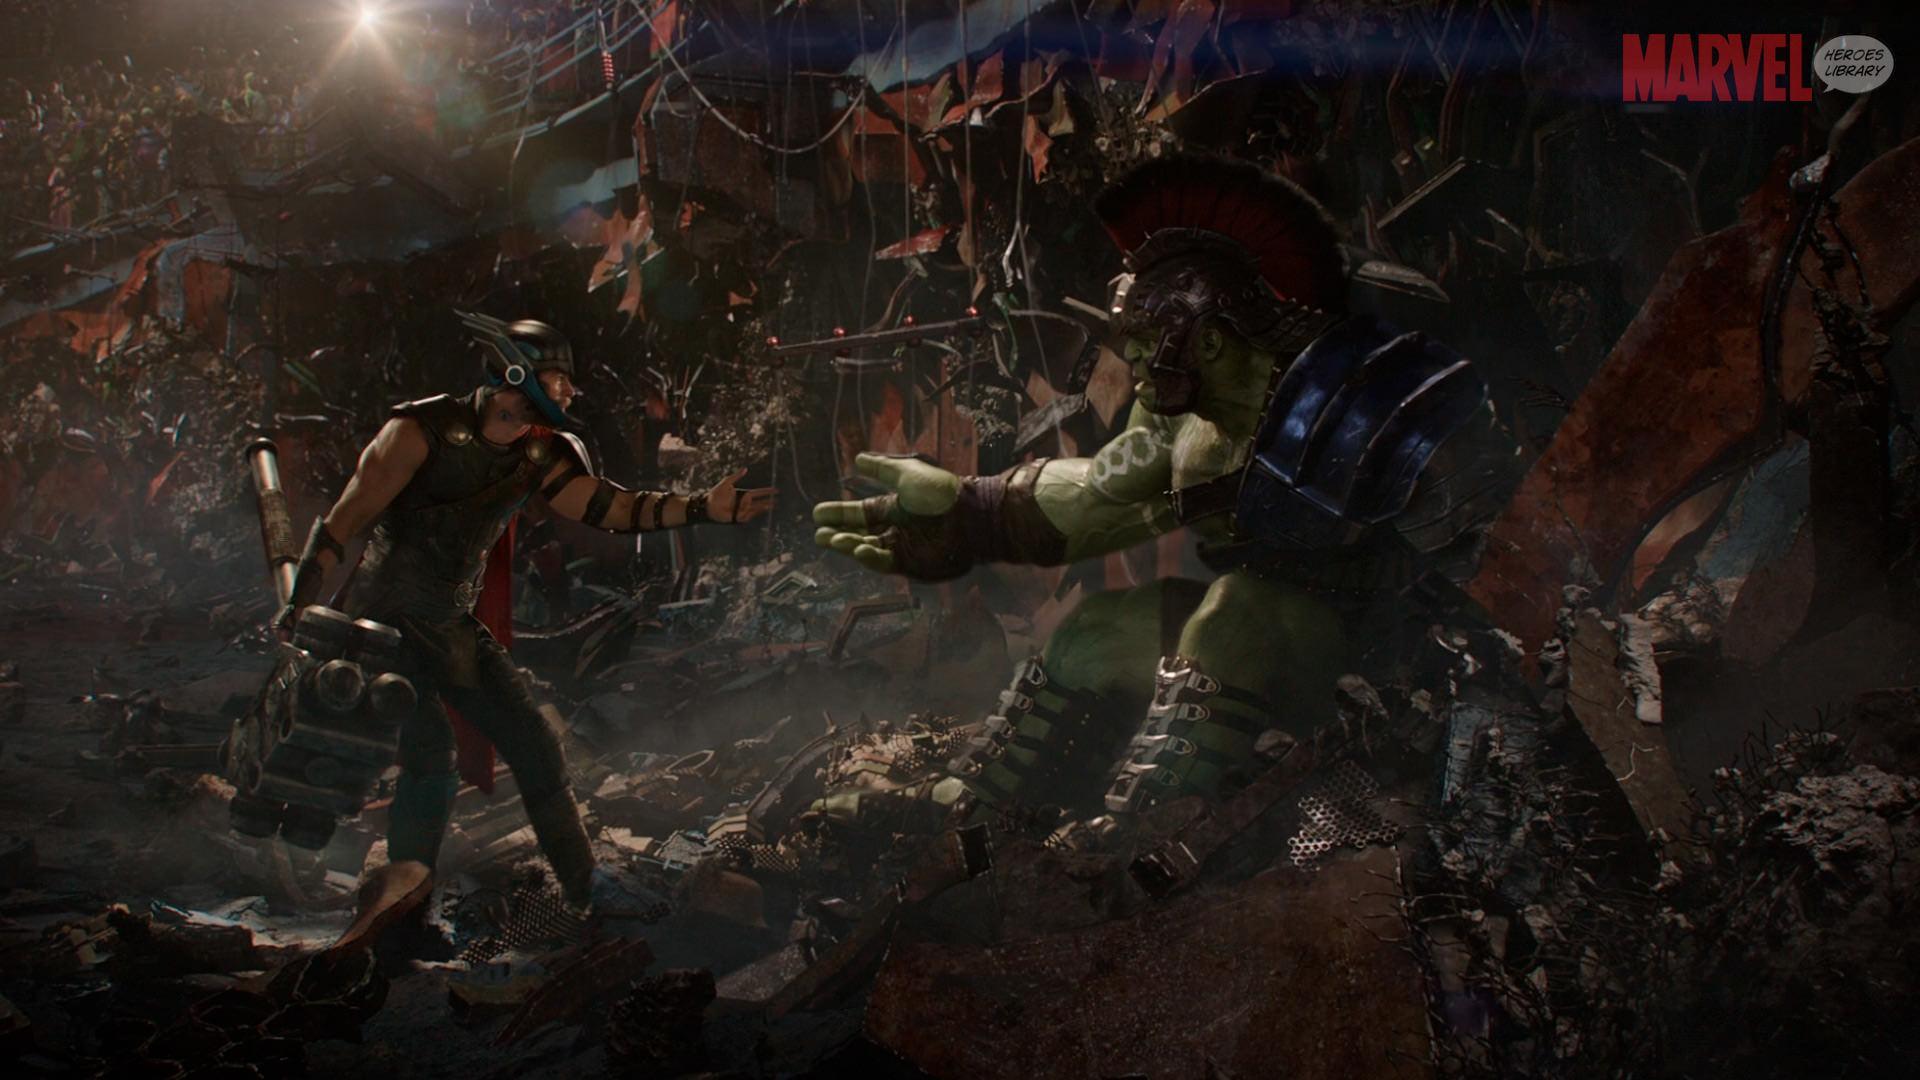 Heimdal Hd Wallpaper: Thor Vs Hulk Wallpapers